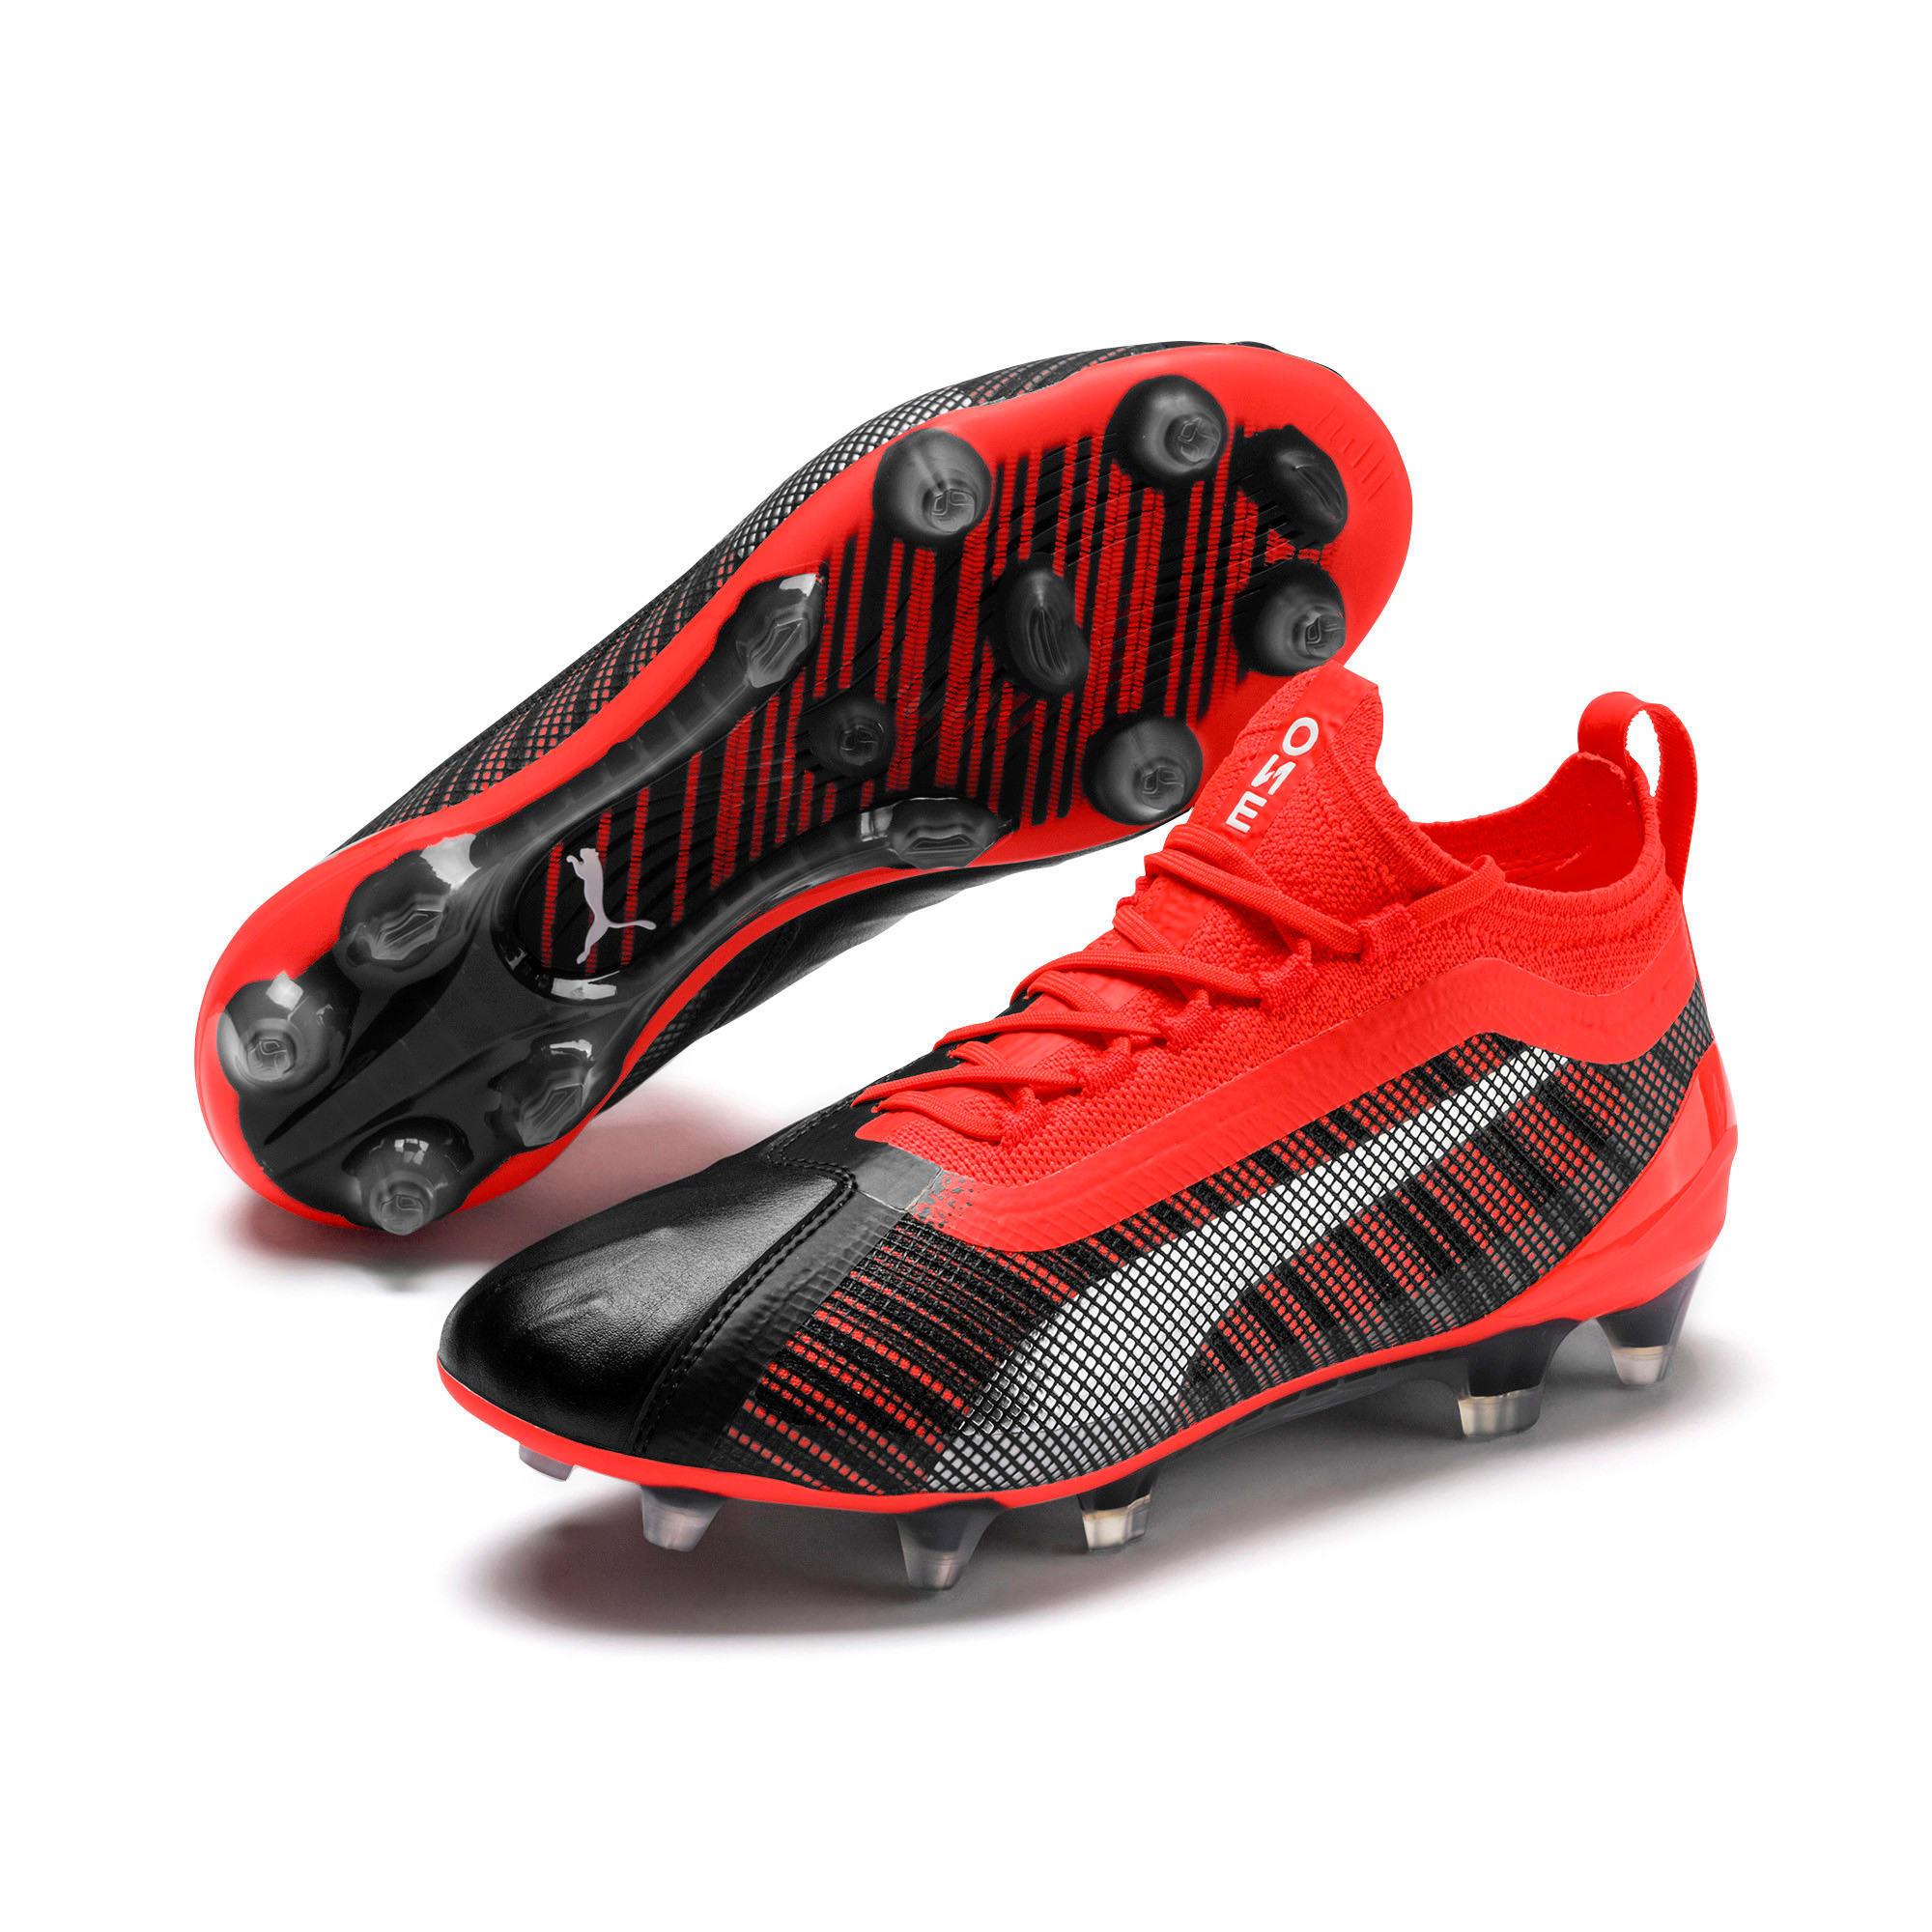 Thumbnail 2 of PUMA ONE 5.1 FG/AG Soccer Cleats JR, Black-Nrgy Red-Aged Silver, medium